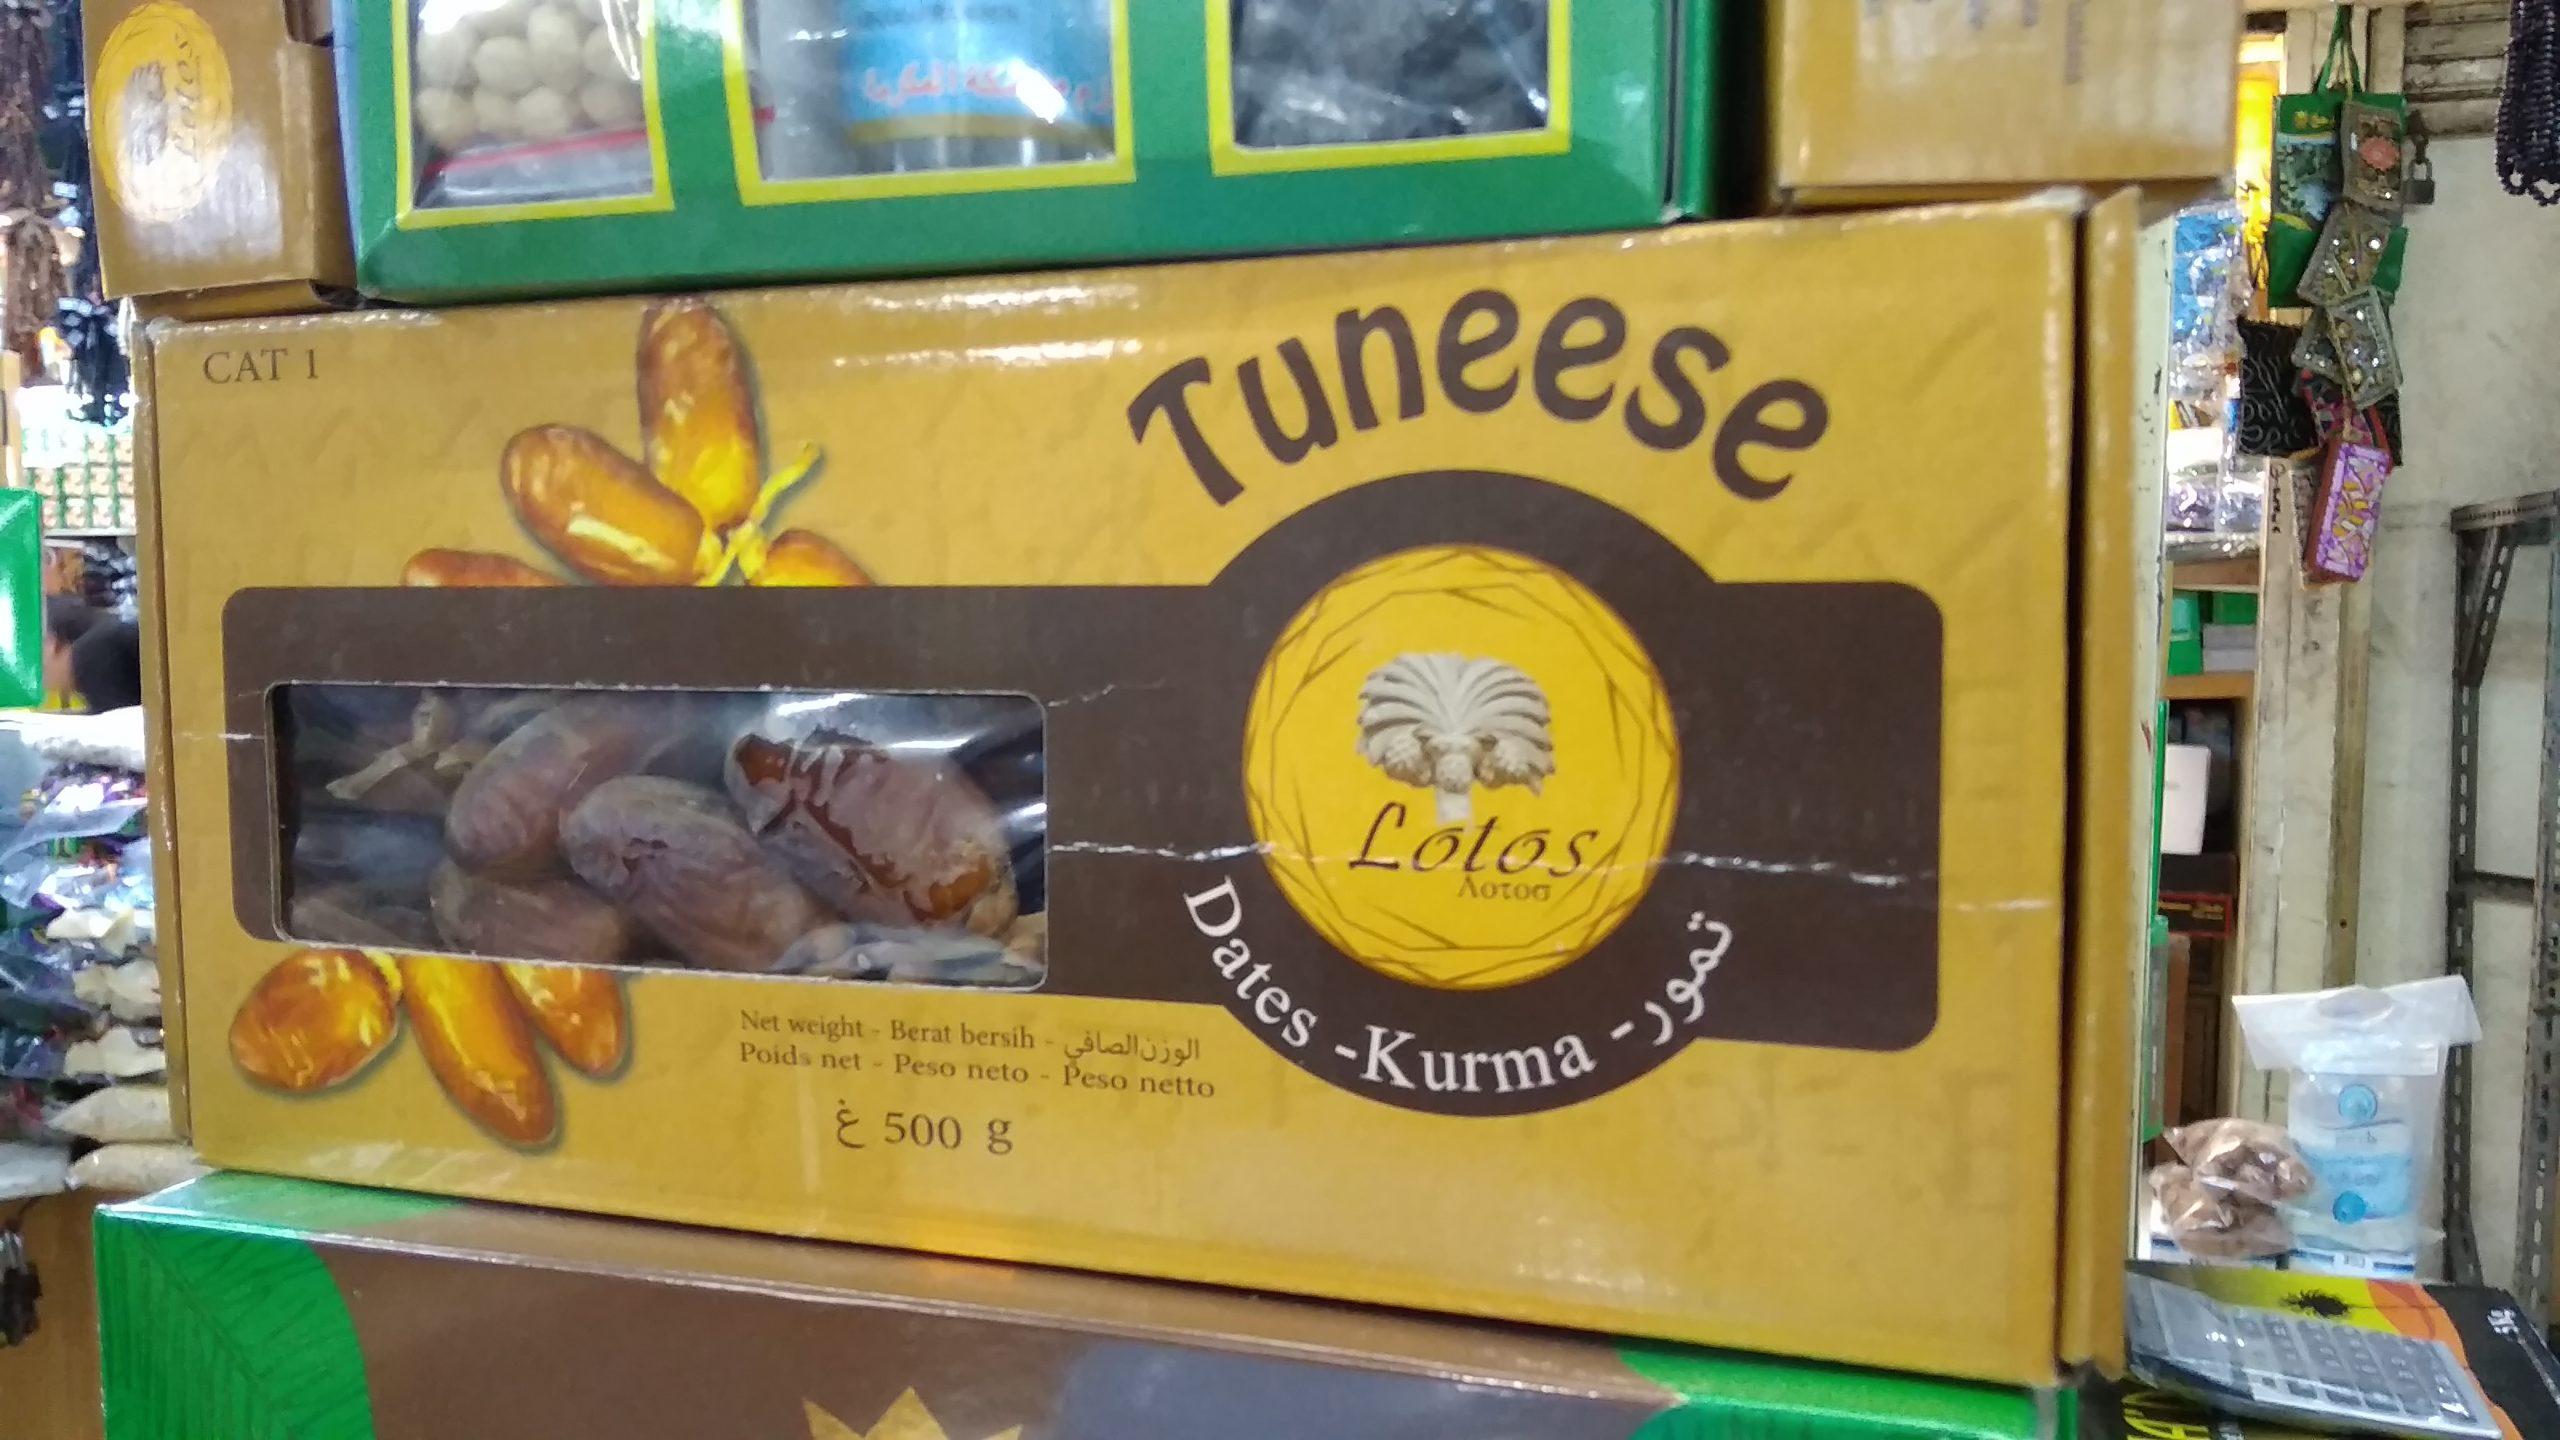 jual kurma tuneese palm fruit tunisia 500 gr